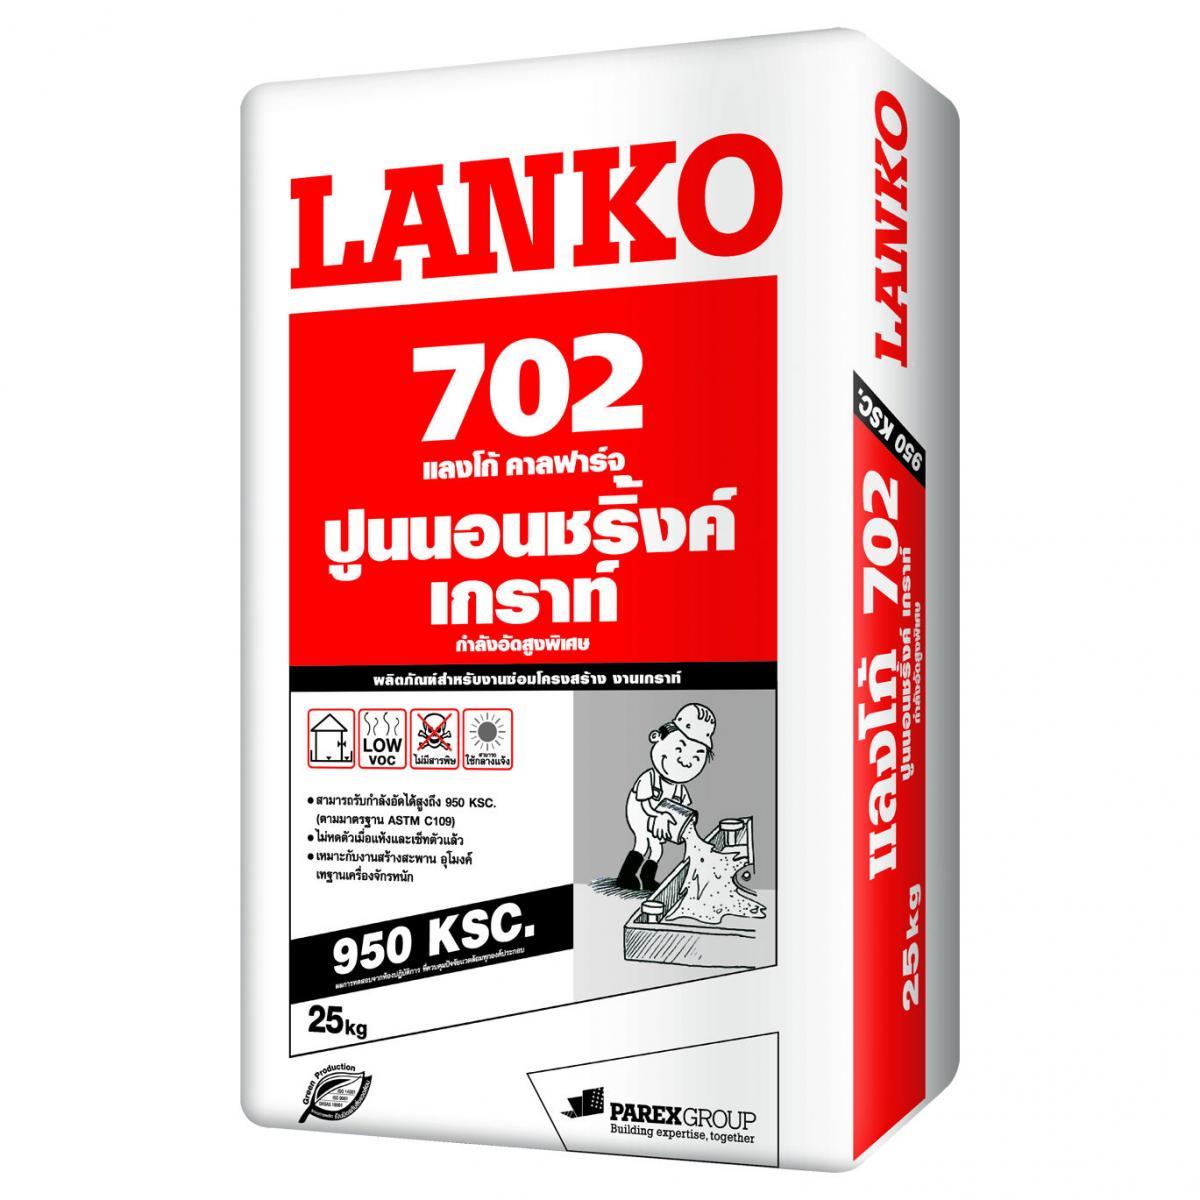 LANKO 702 ปูนนอนชริ้งค์เกราท์ รับกำลังอัดสูงพิเศษ